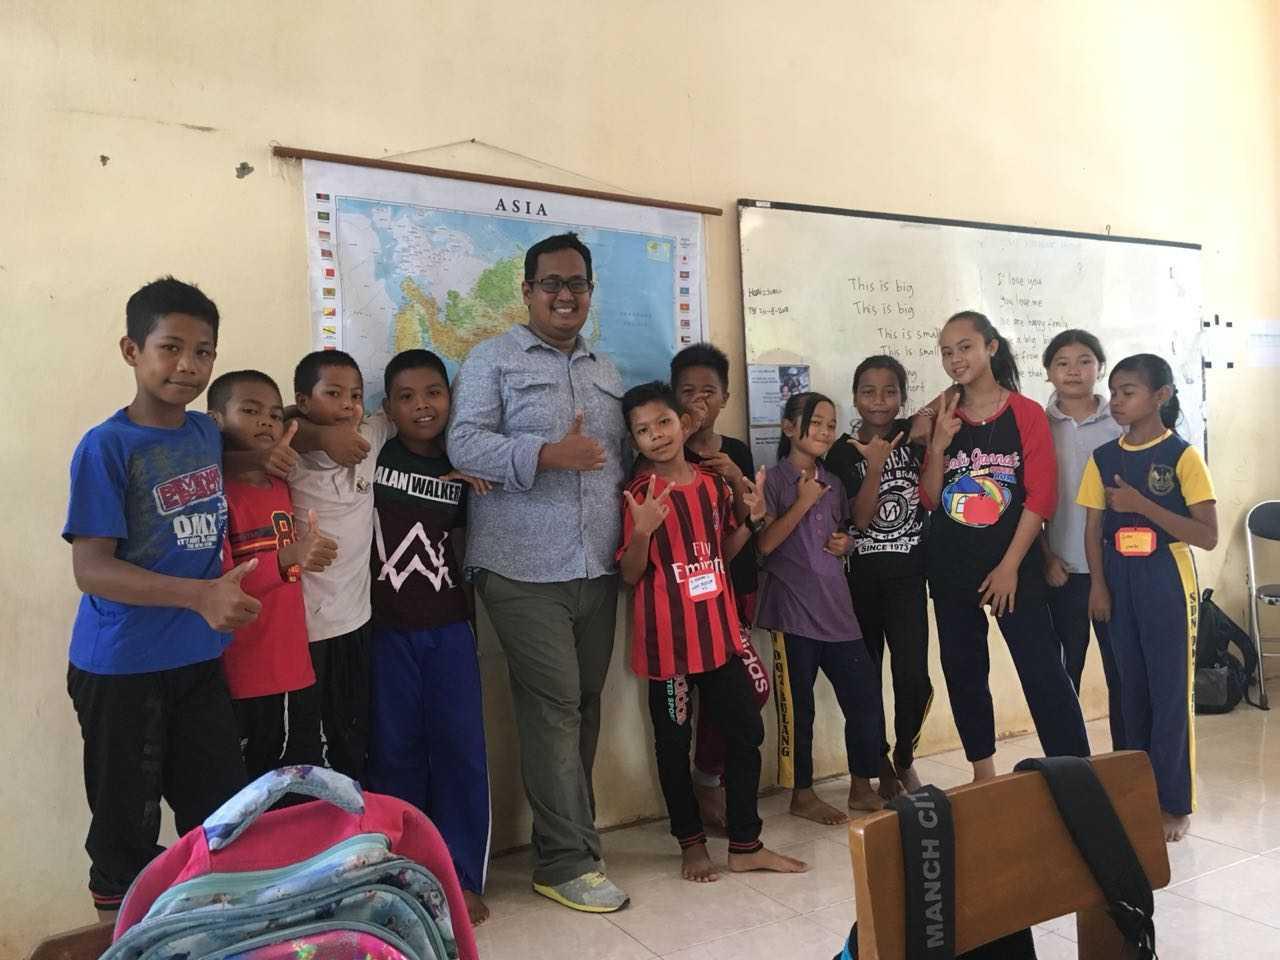 Serunya bersama membuat vlog bersama murid kelas 6 SDN 006 Bulang (dokpri)